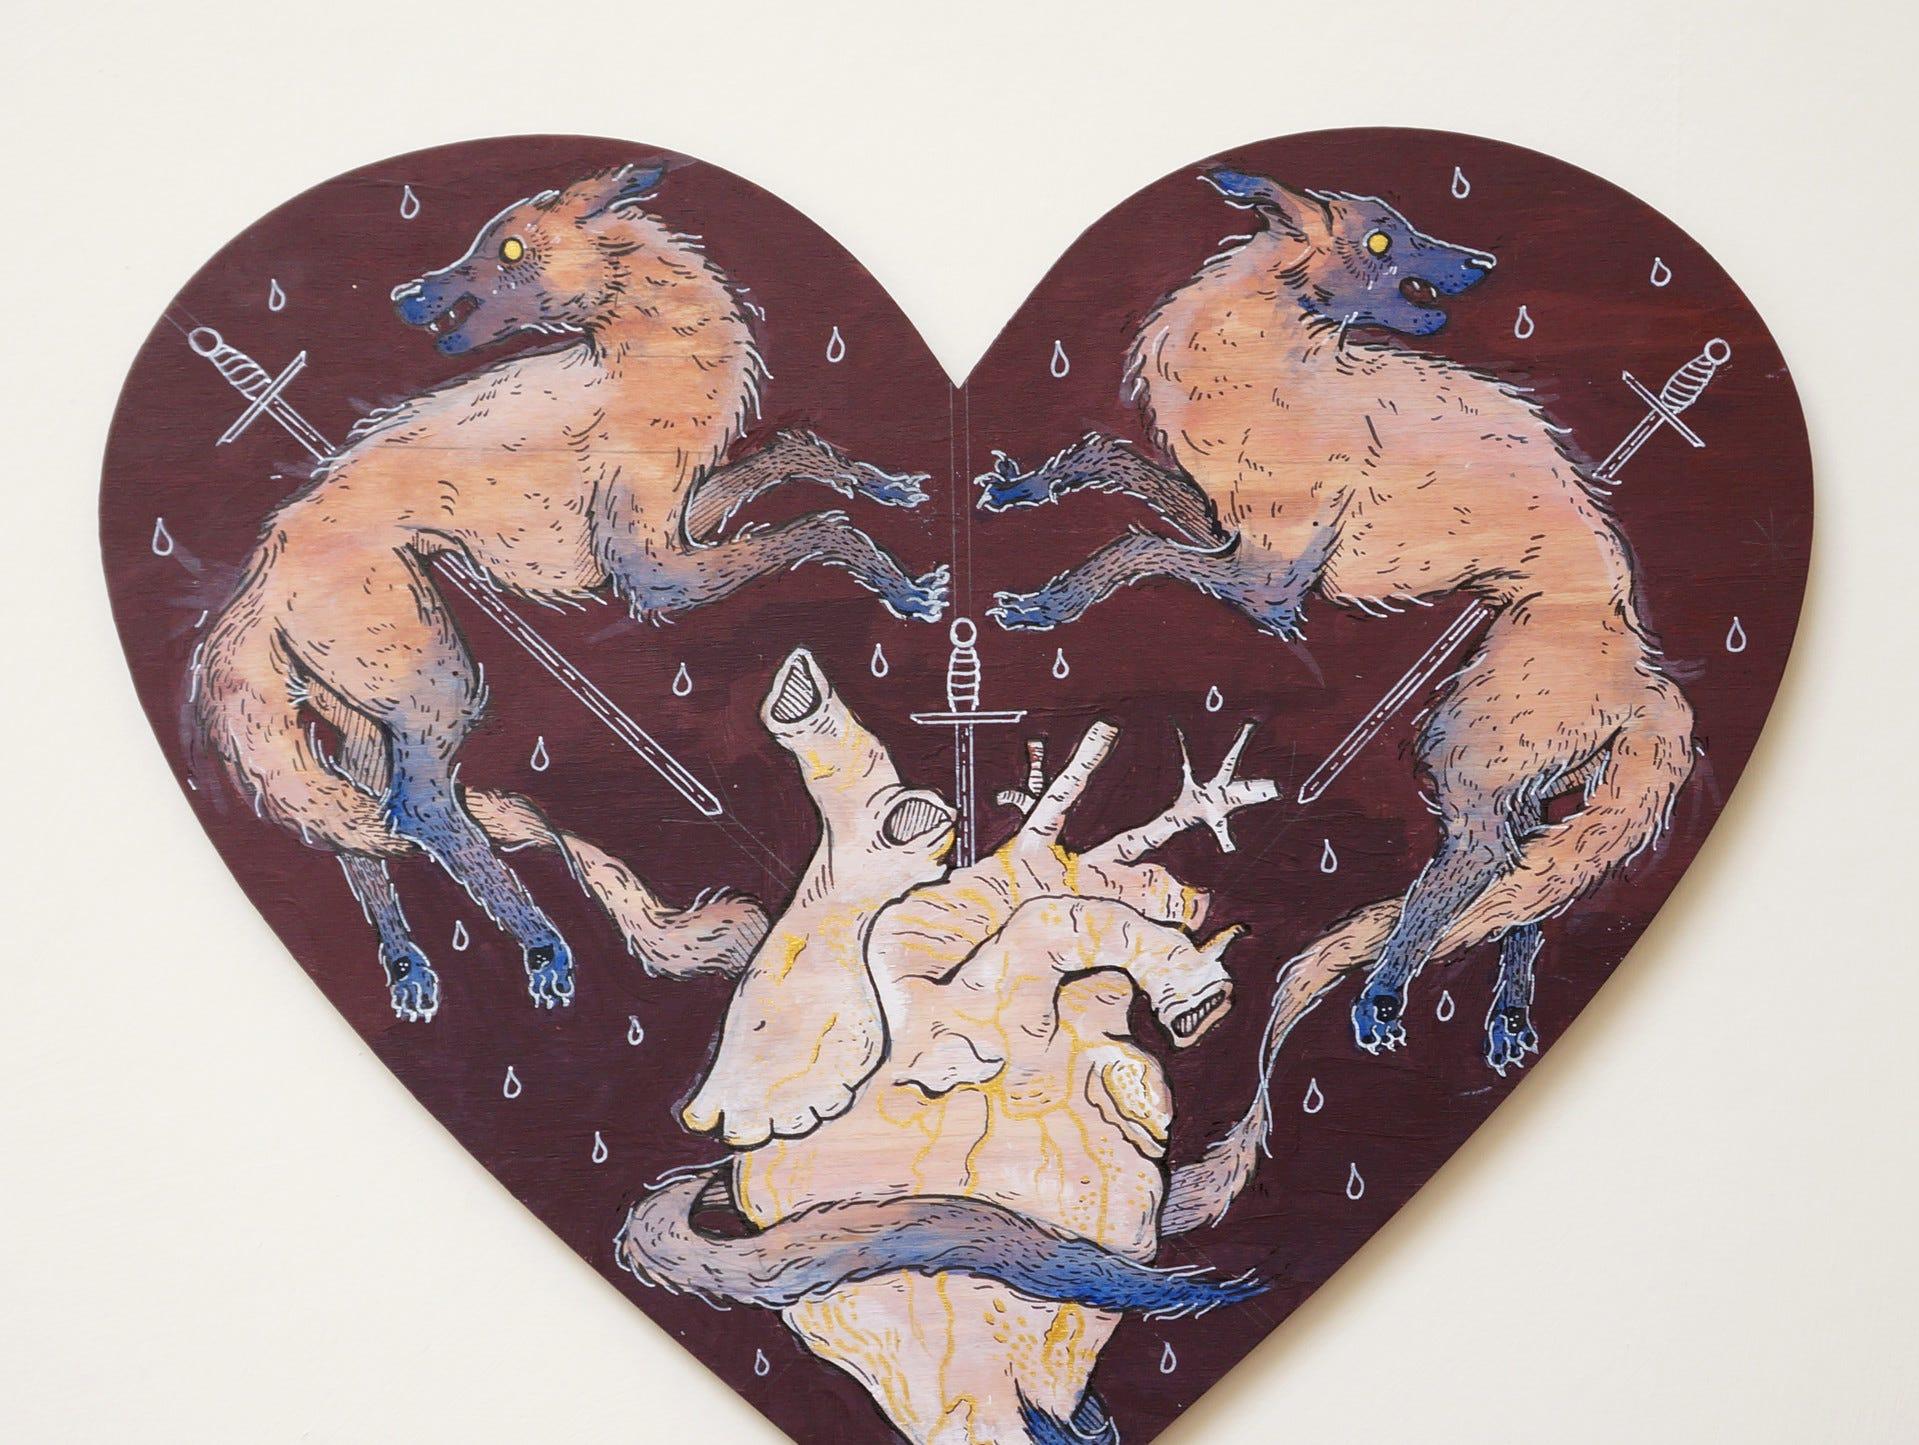 Champlain senior Amila Nuhodzic, is both an illustrator and now a 3D visual artist.  More at: ww.artstation.com/amila